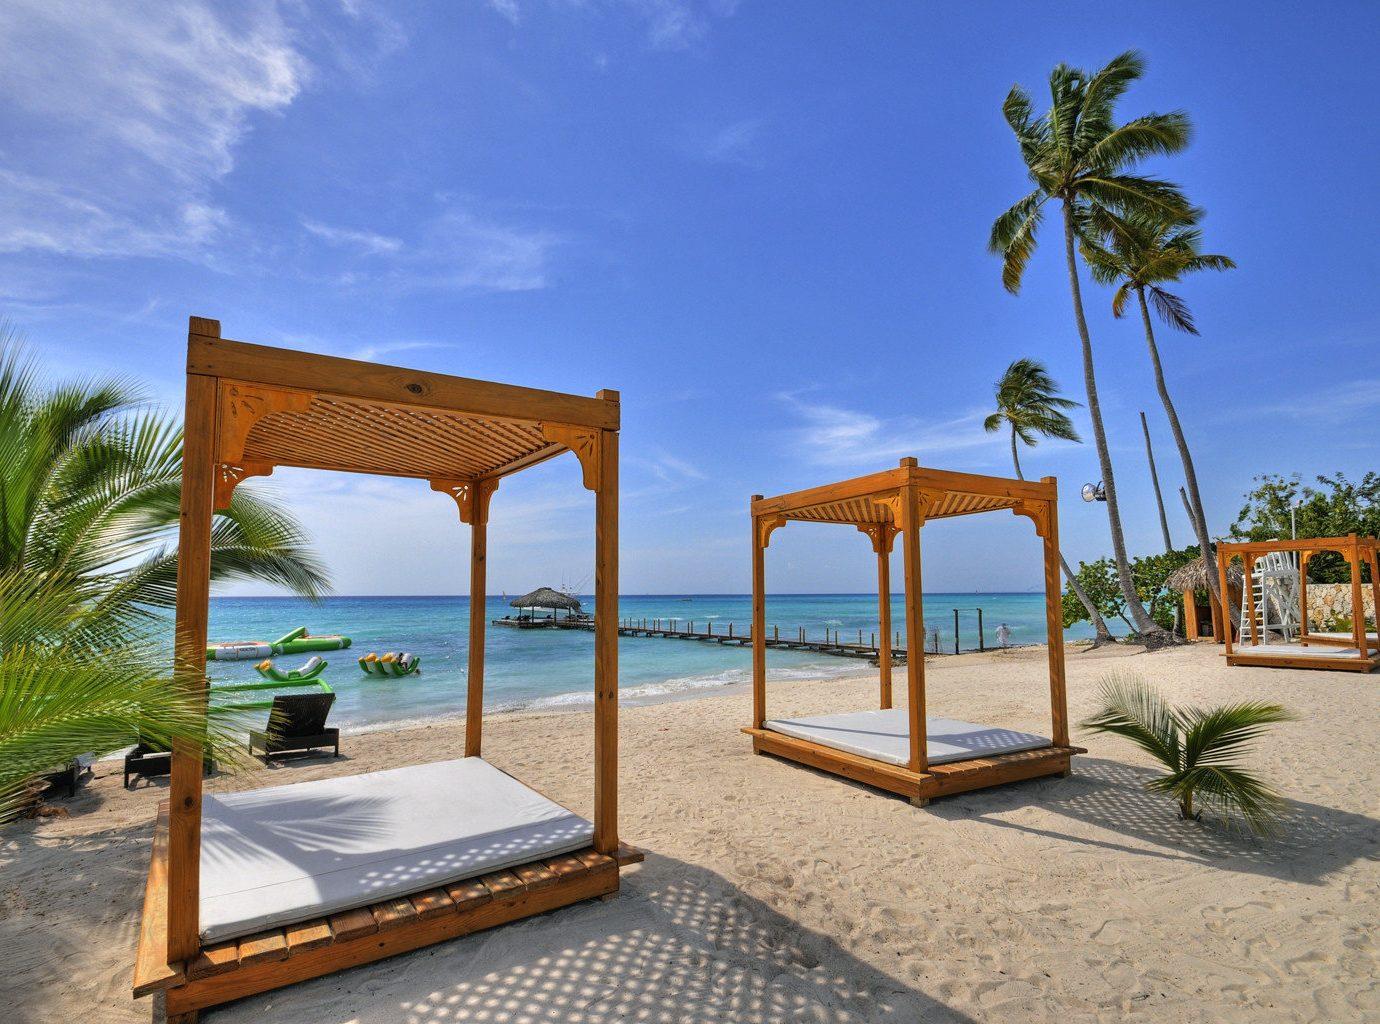 Beach Beachfront Lounge Luxury Ocean sky ground chair leisure property Resort caribbean Villa swimming pool palm Pool home Sea hacienda condominium sandy shade day